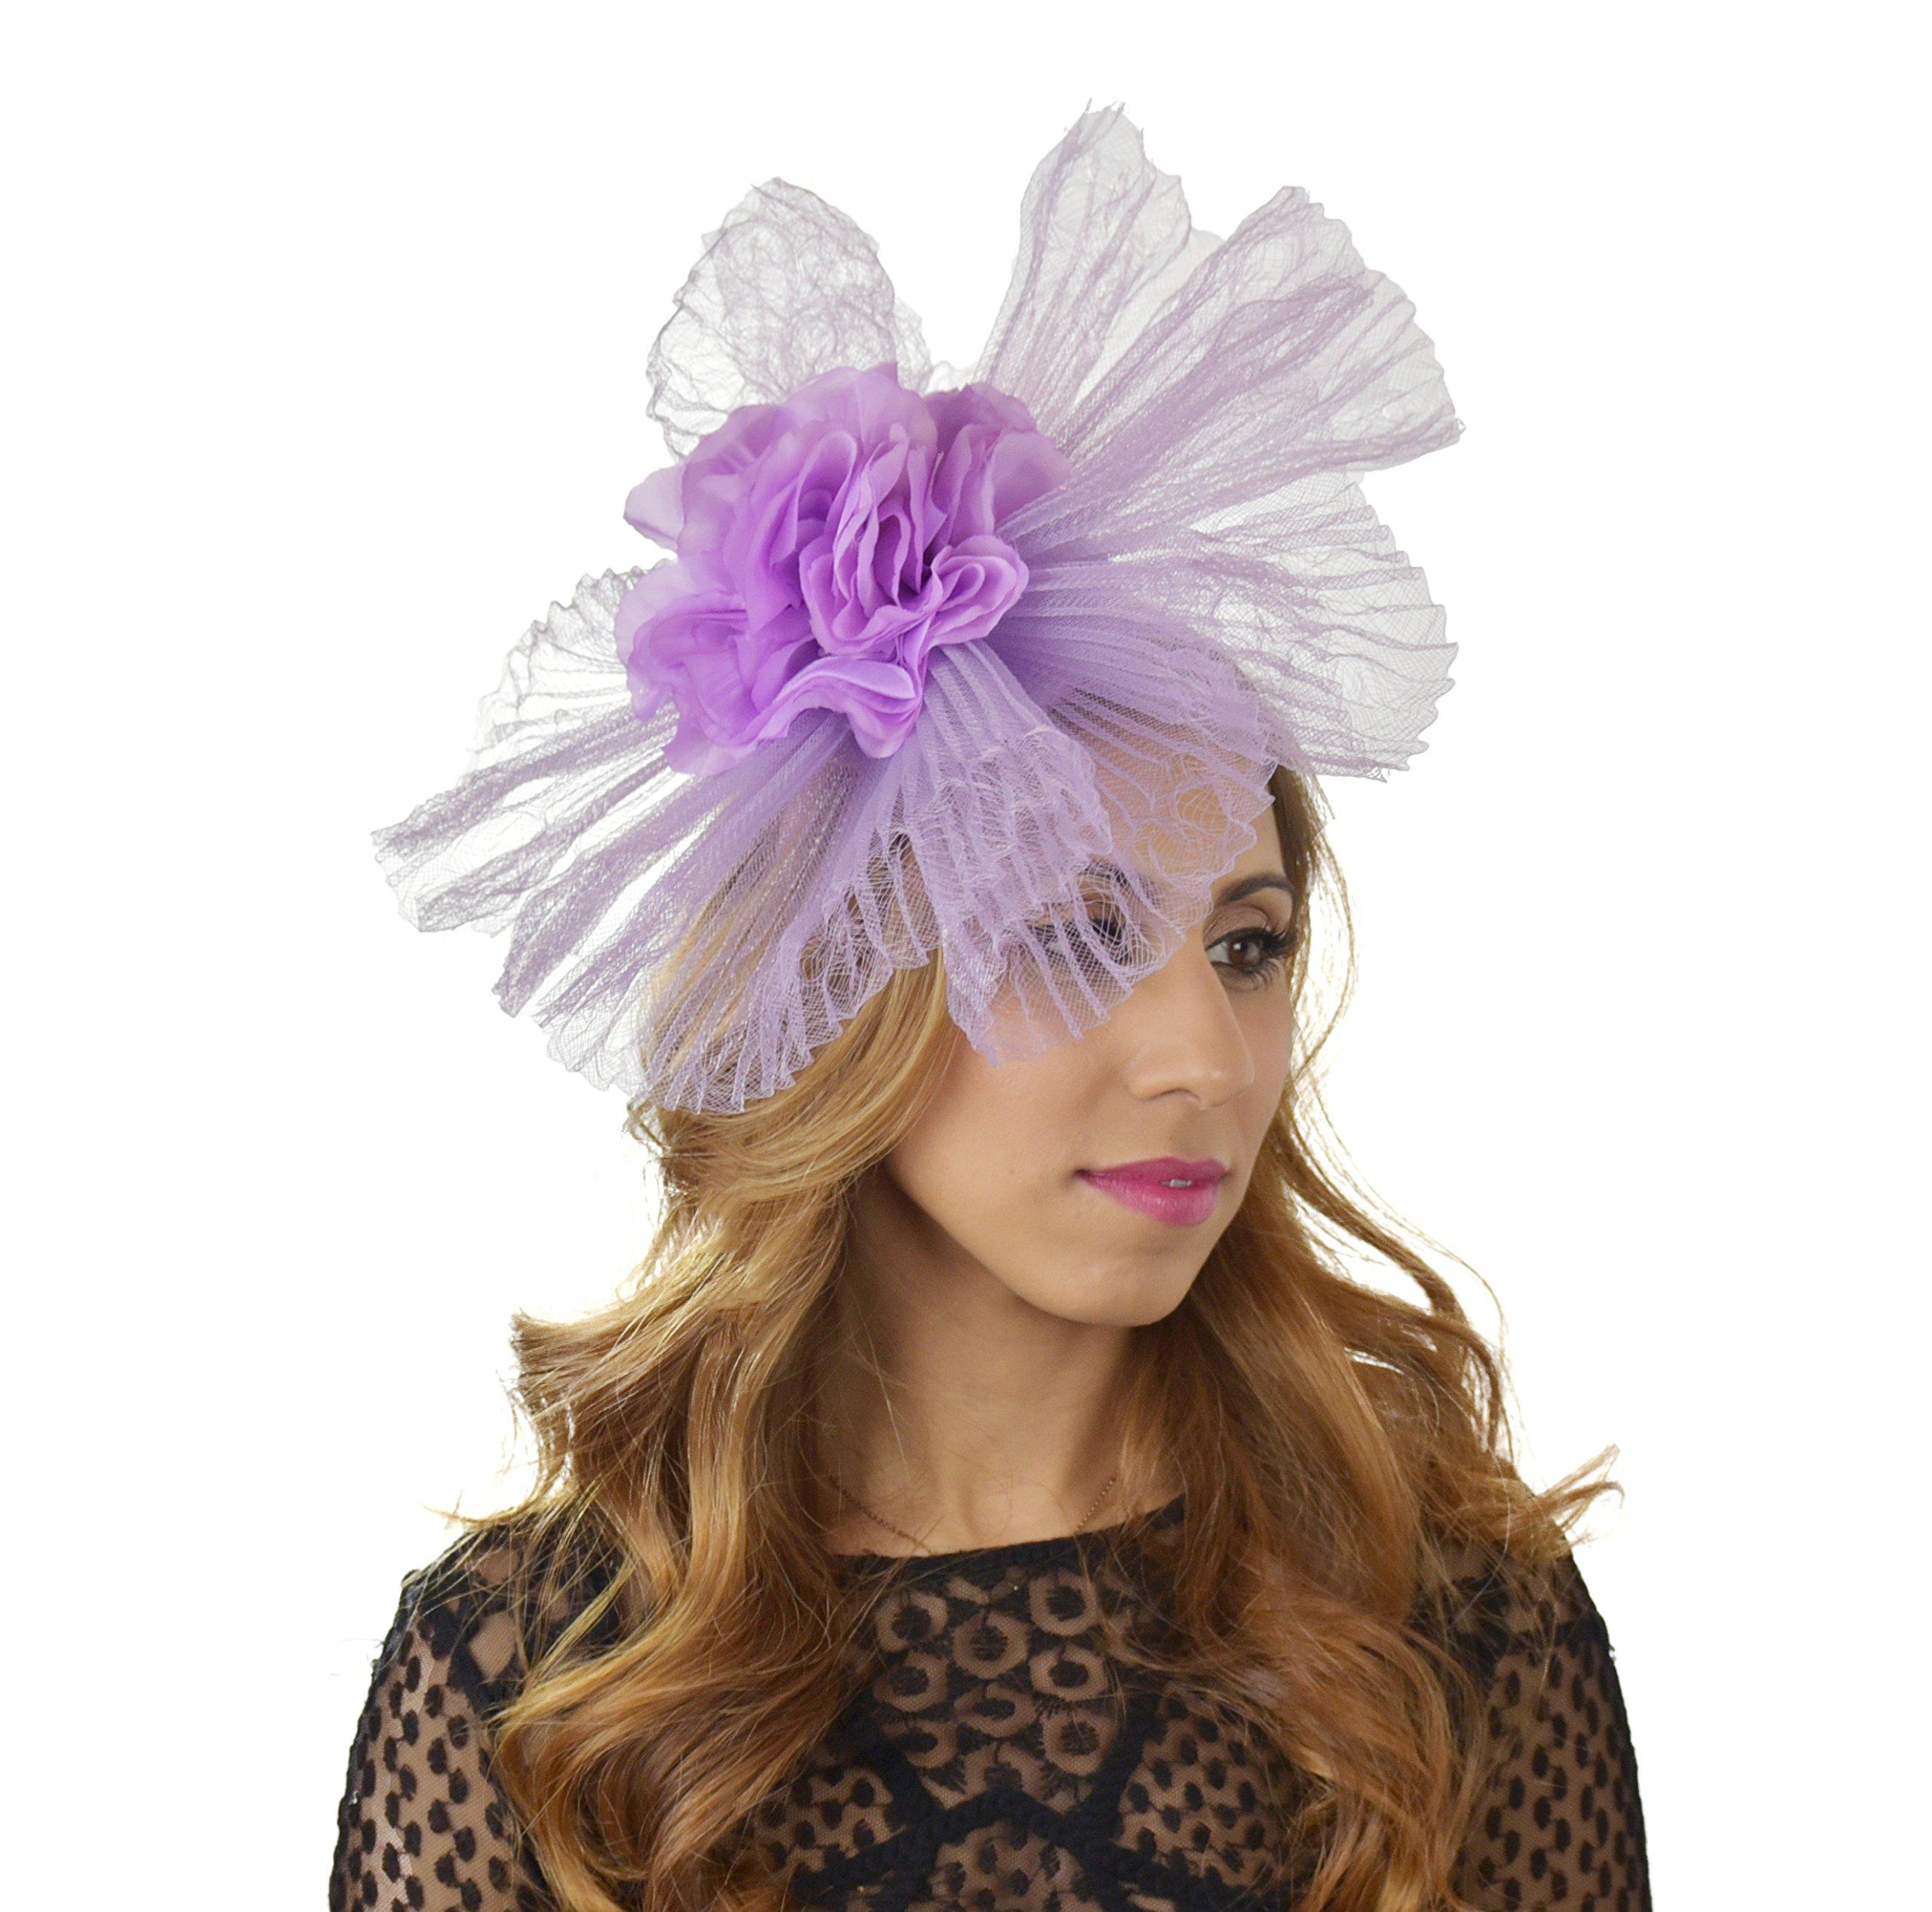 Hats By Cressida crin & Silk Flower Elegant Ladies Ascot Wedding Fascinator Hat Lilac by Hats By Cressida